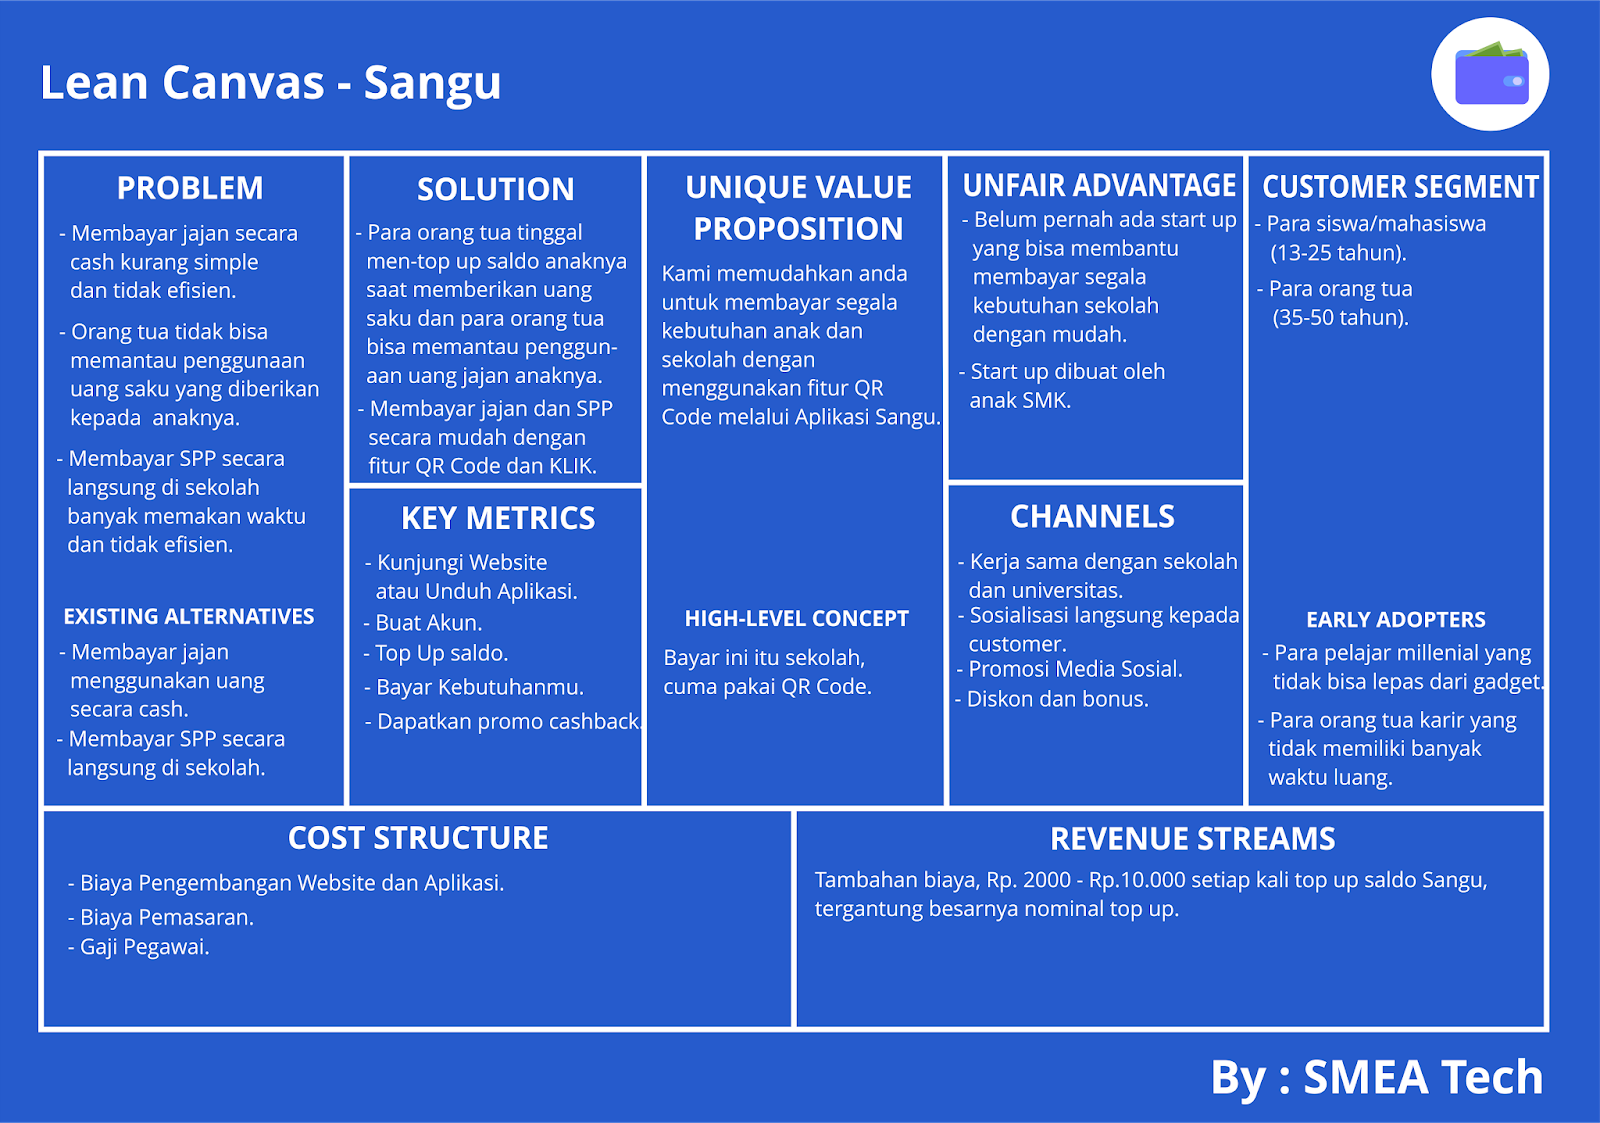 Contoh dan Cara Membuat Lean Canvas atau Model Business Canvas